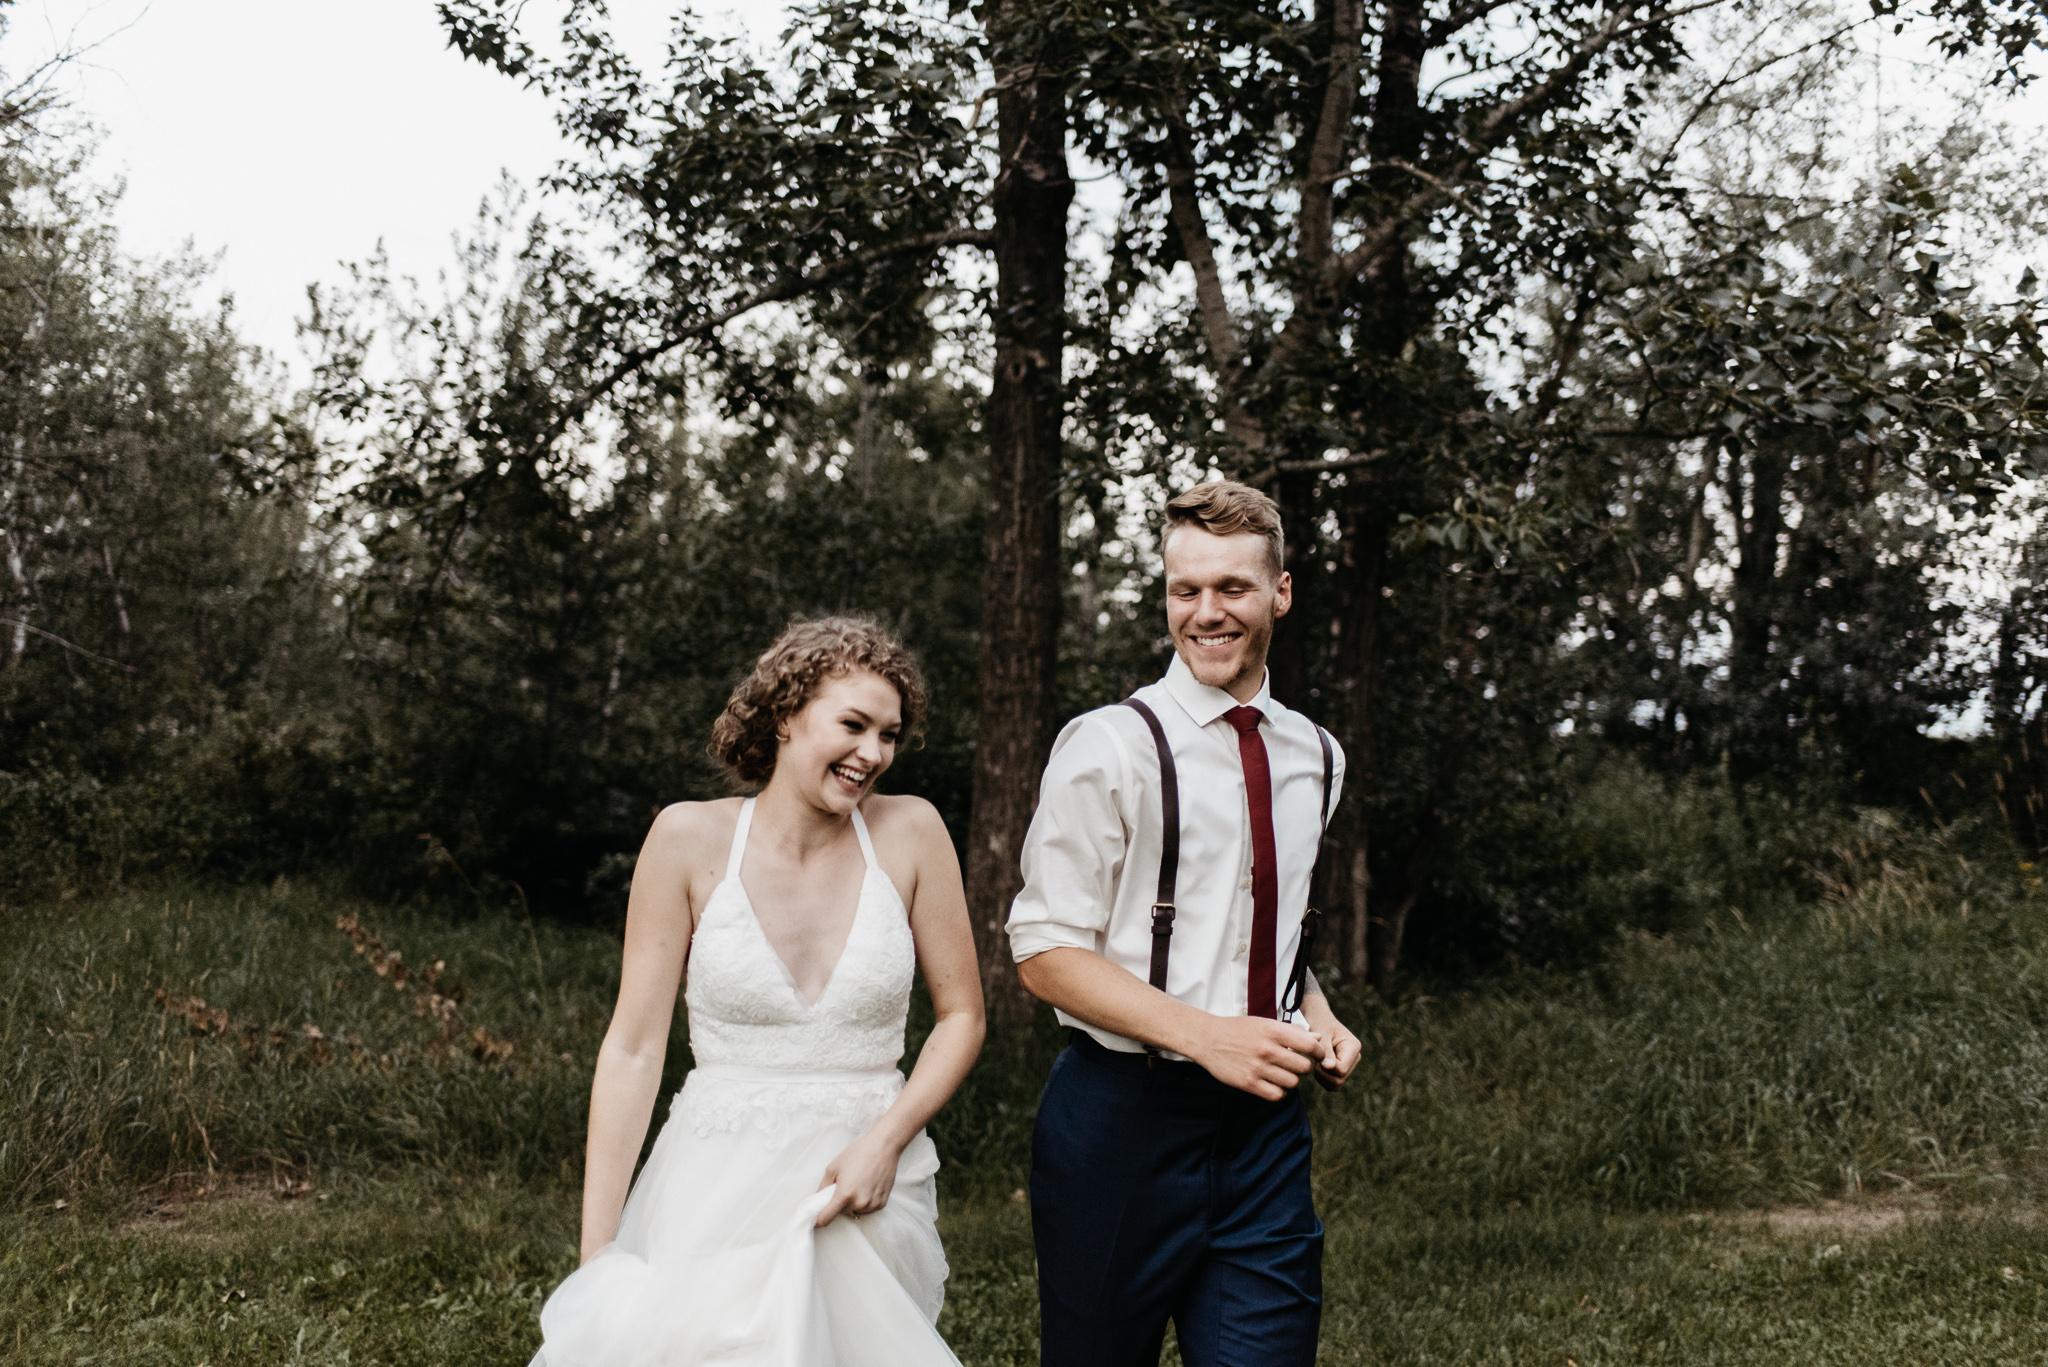 J&C-Weddingblog-119.jpg